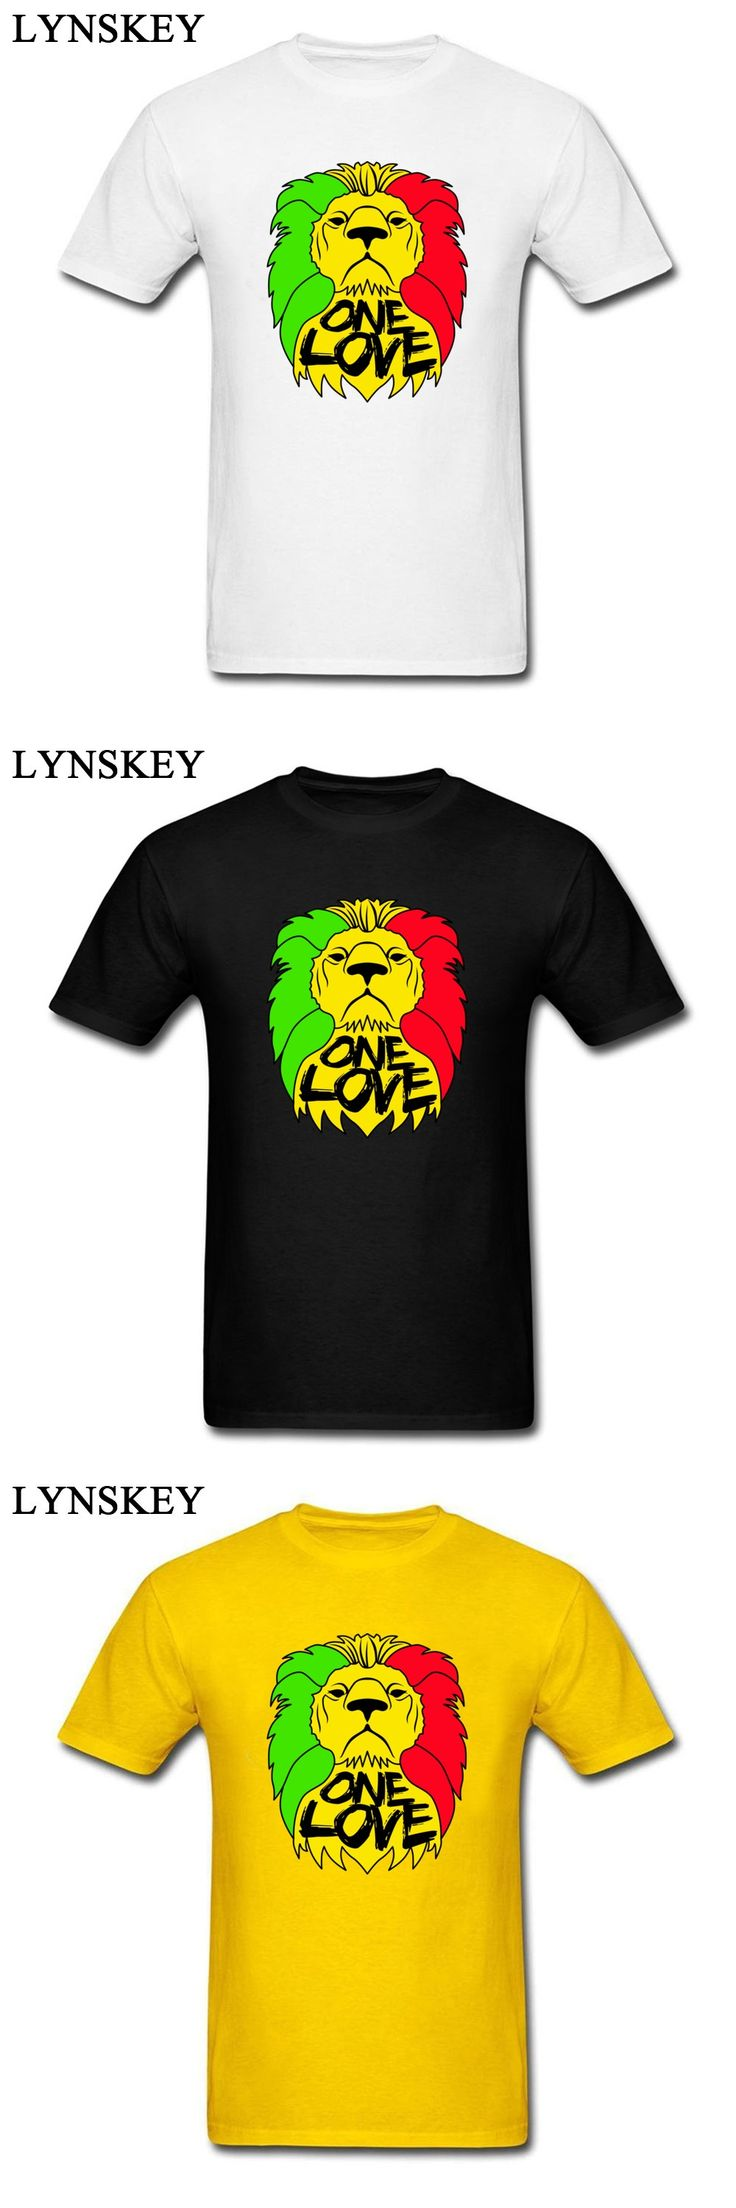 One Love Rasta Men's Pure Cotton O-Neck Casual Tops T Shirt Gold King Lion 2018 Latest Hip Hop Street Fashion T Shirts